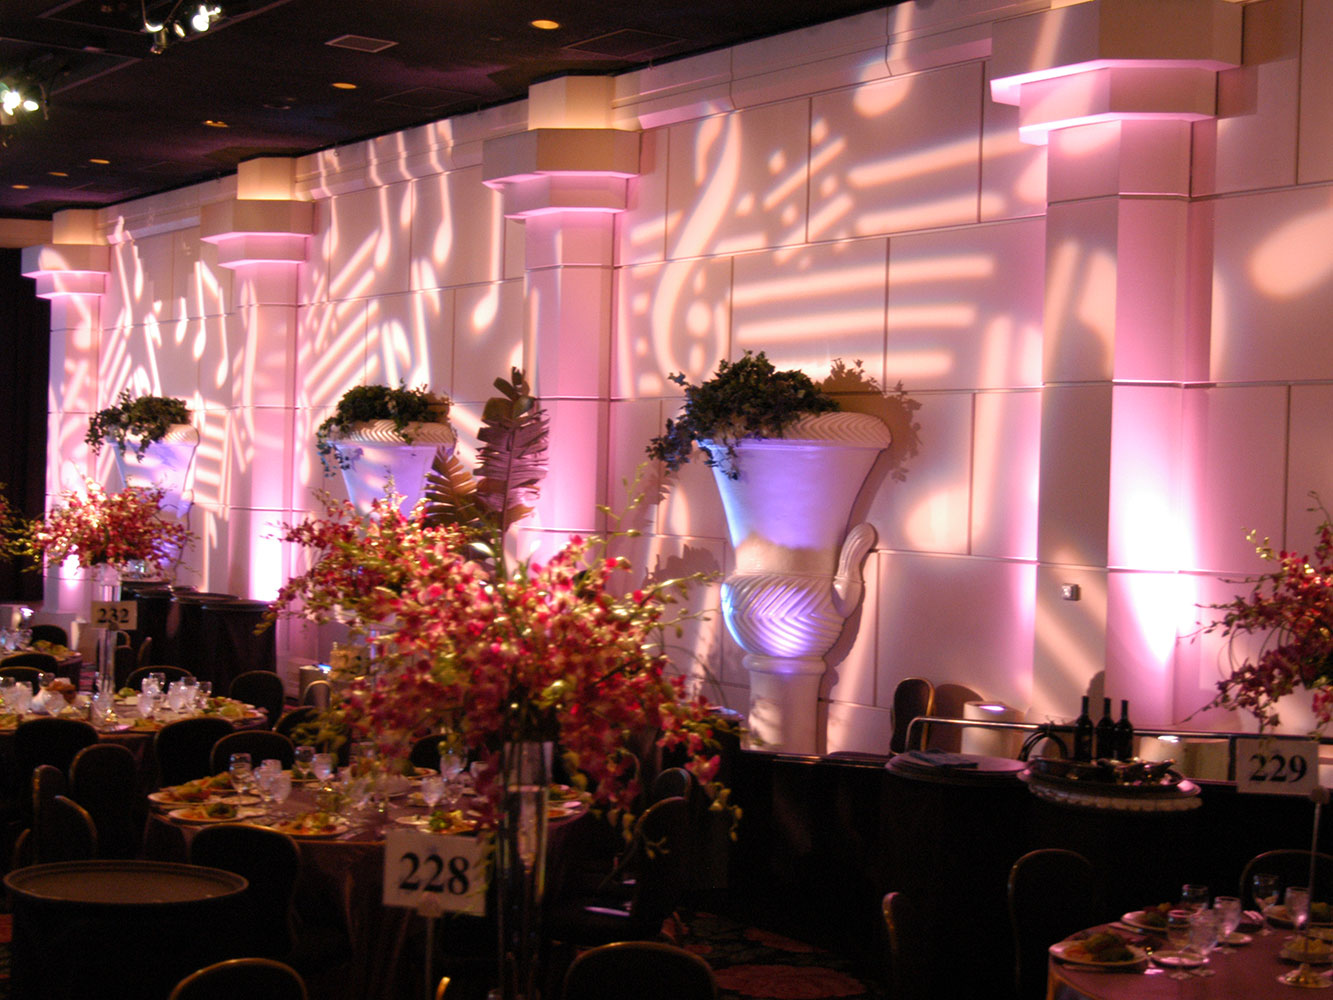 John-Wayne-Cancer-Event---Lighting-&-Decor